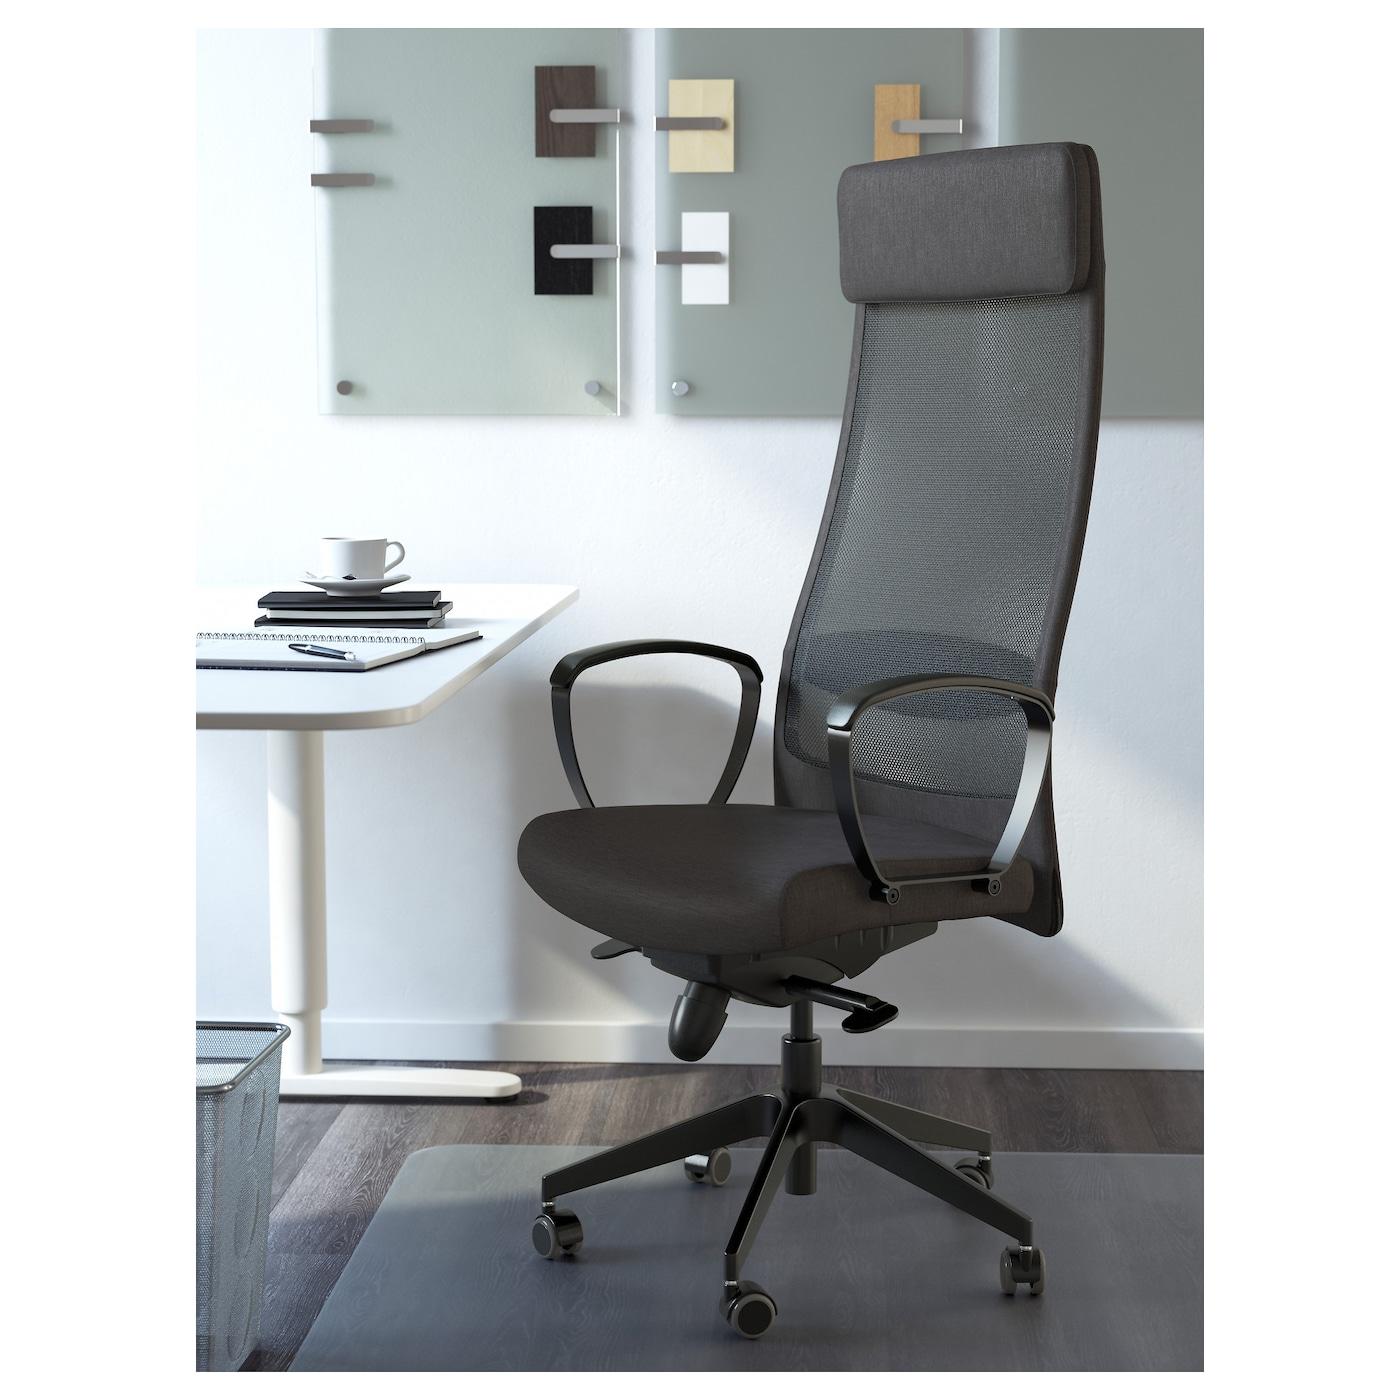 Markus silla giratoria vissle gris oscuro ikea - Sillas trabajo ikea ...